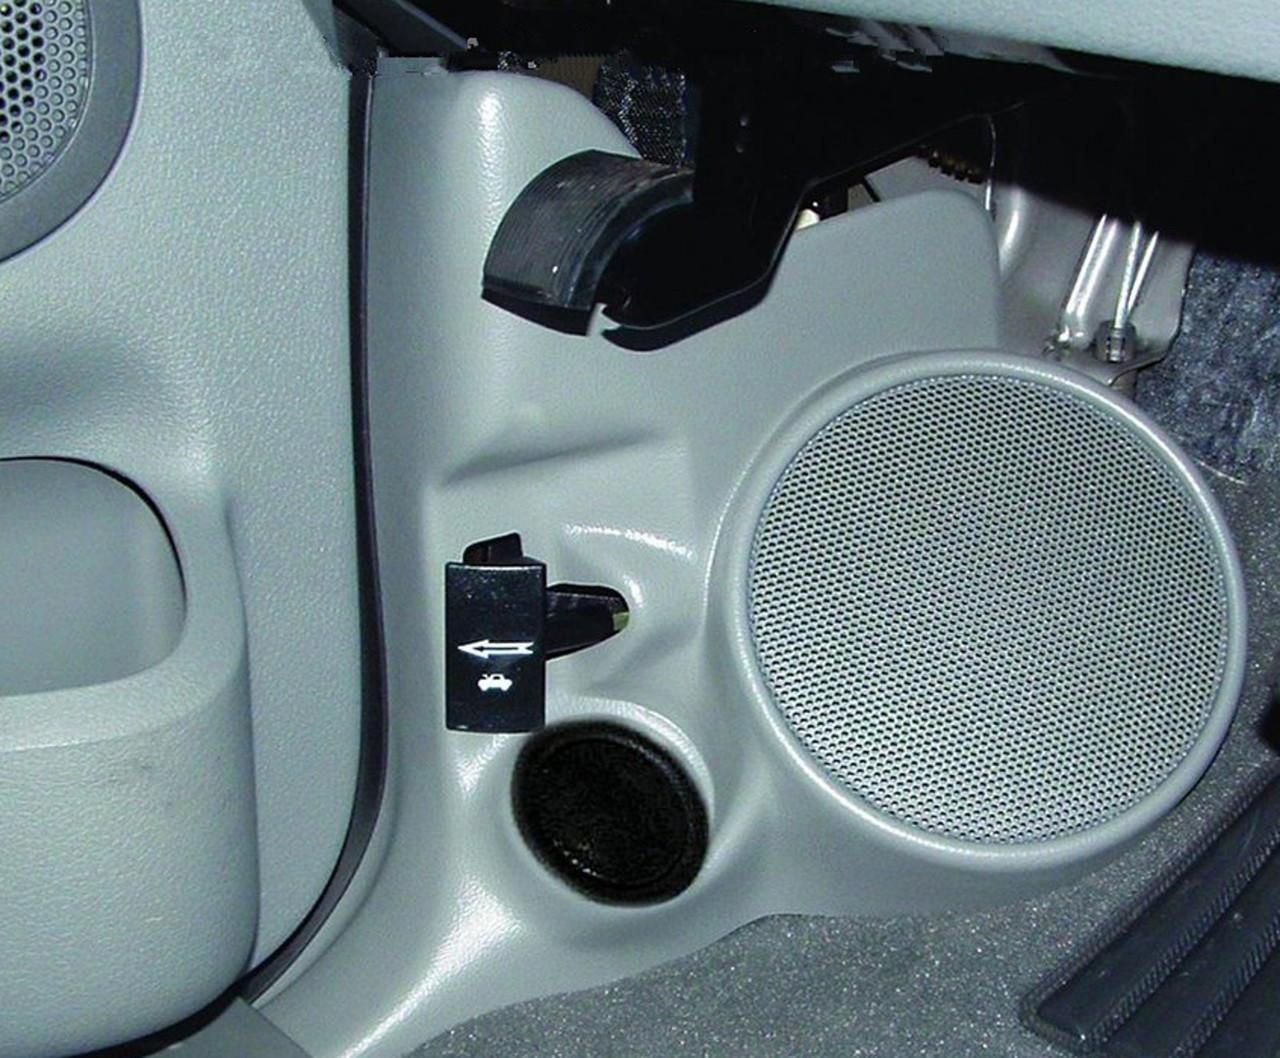 1995 Sho Audio Wiring Help Please Taurus Car Club Of America